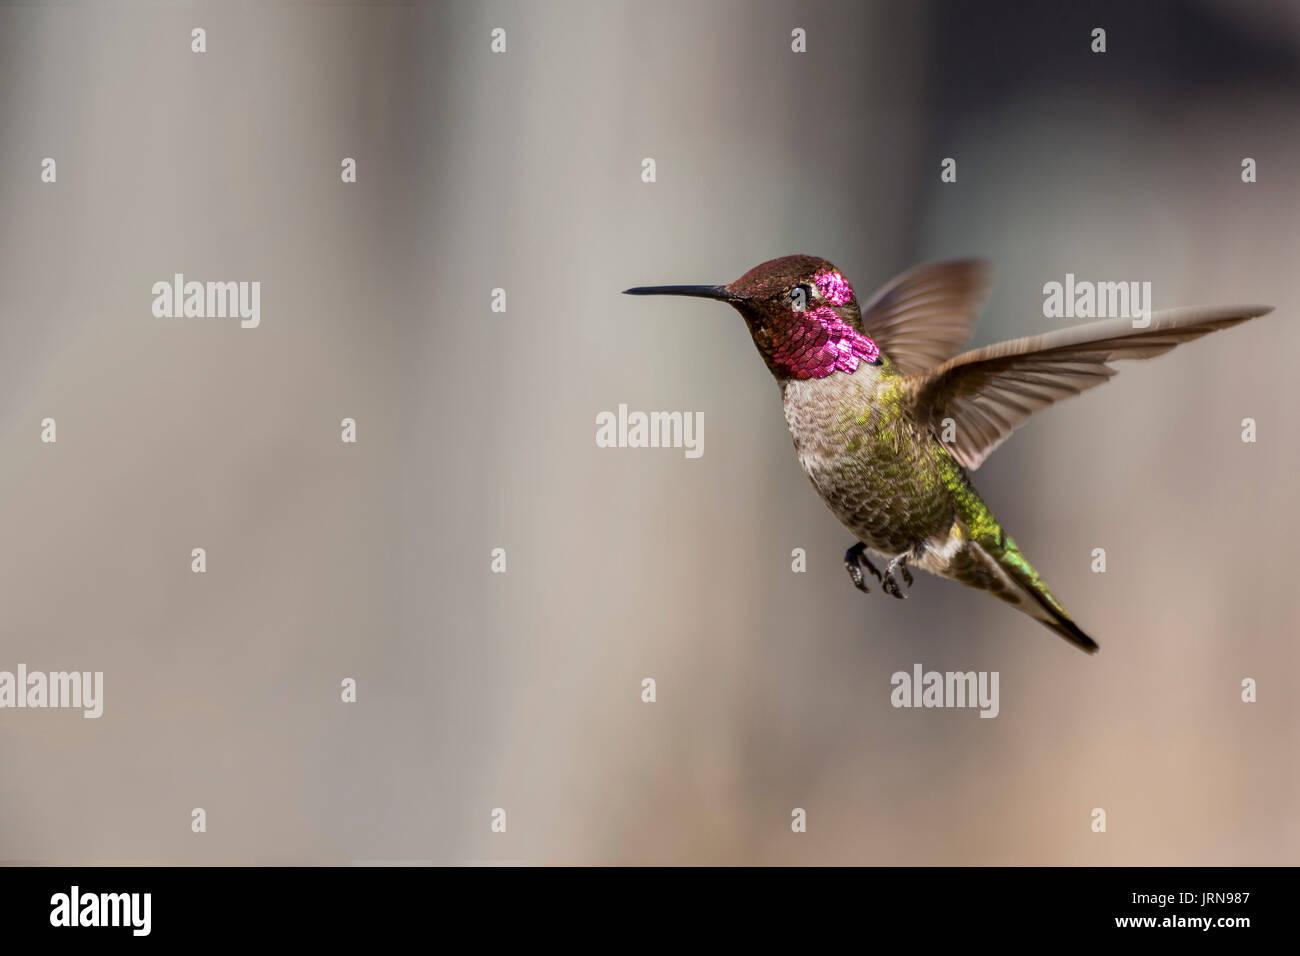 Anna's Hummingbird - Stock Image